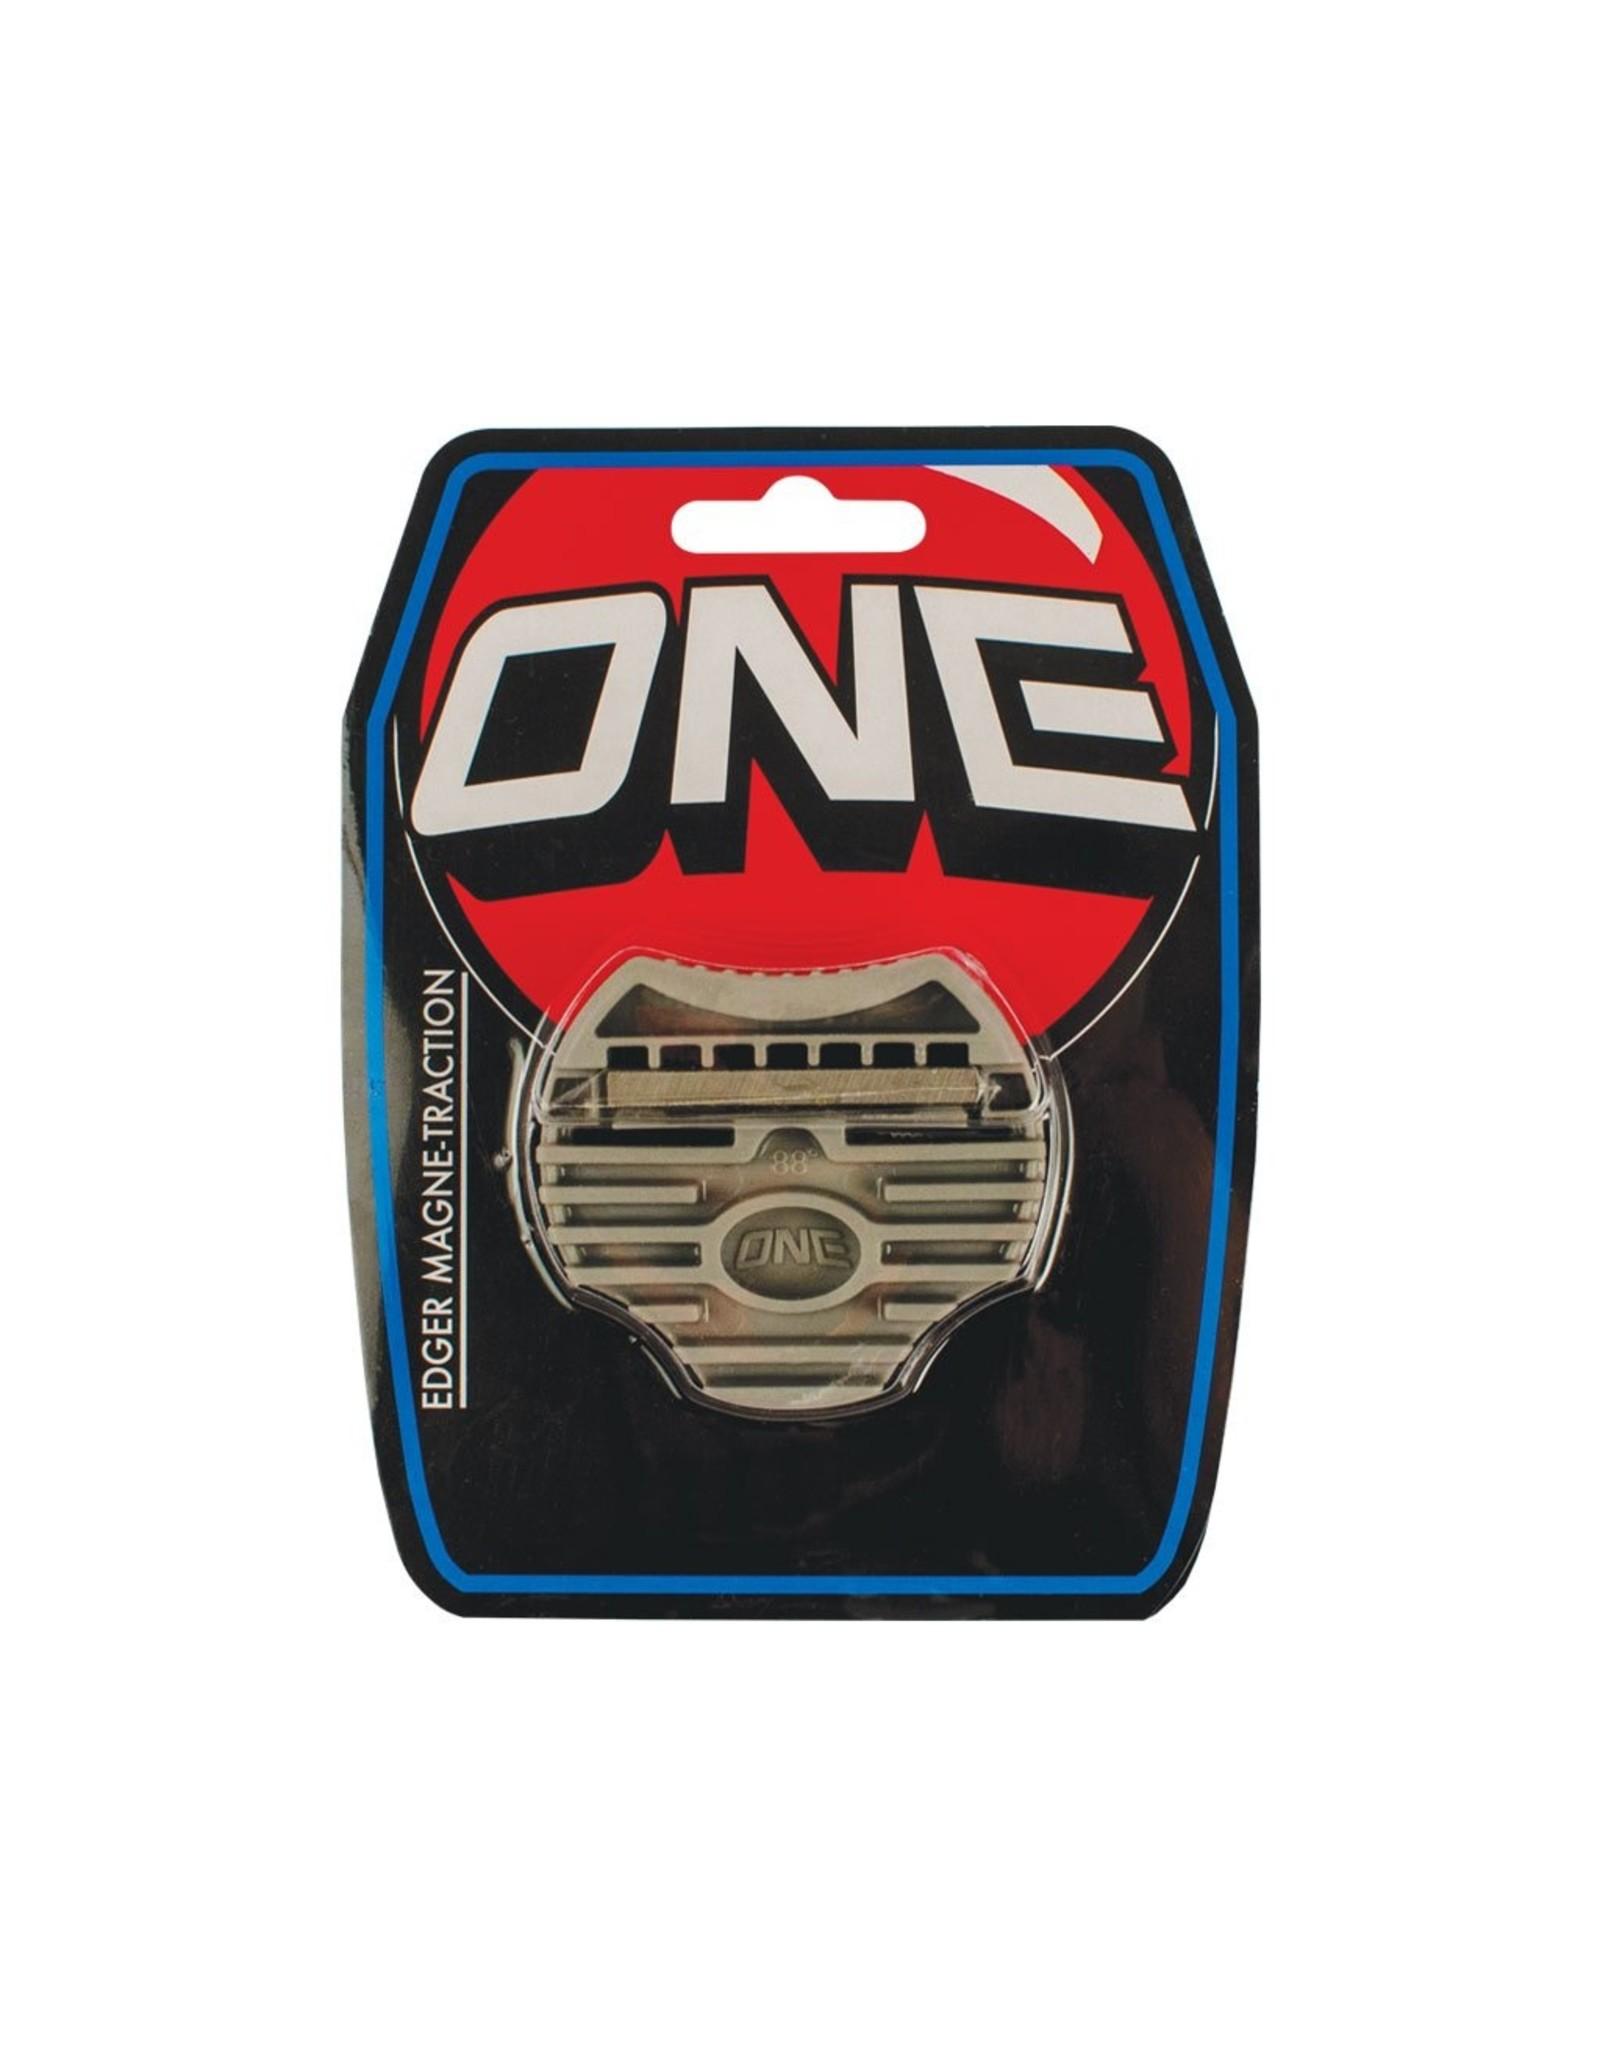 Oneball Mfg. MAGNE-TRACTION EDGE TOOL